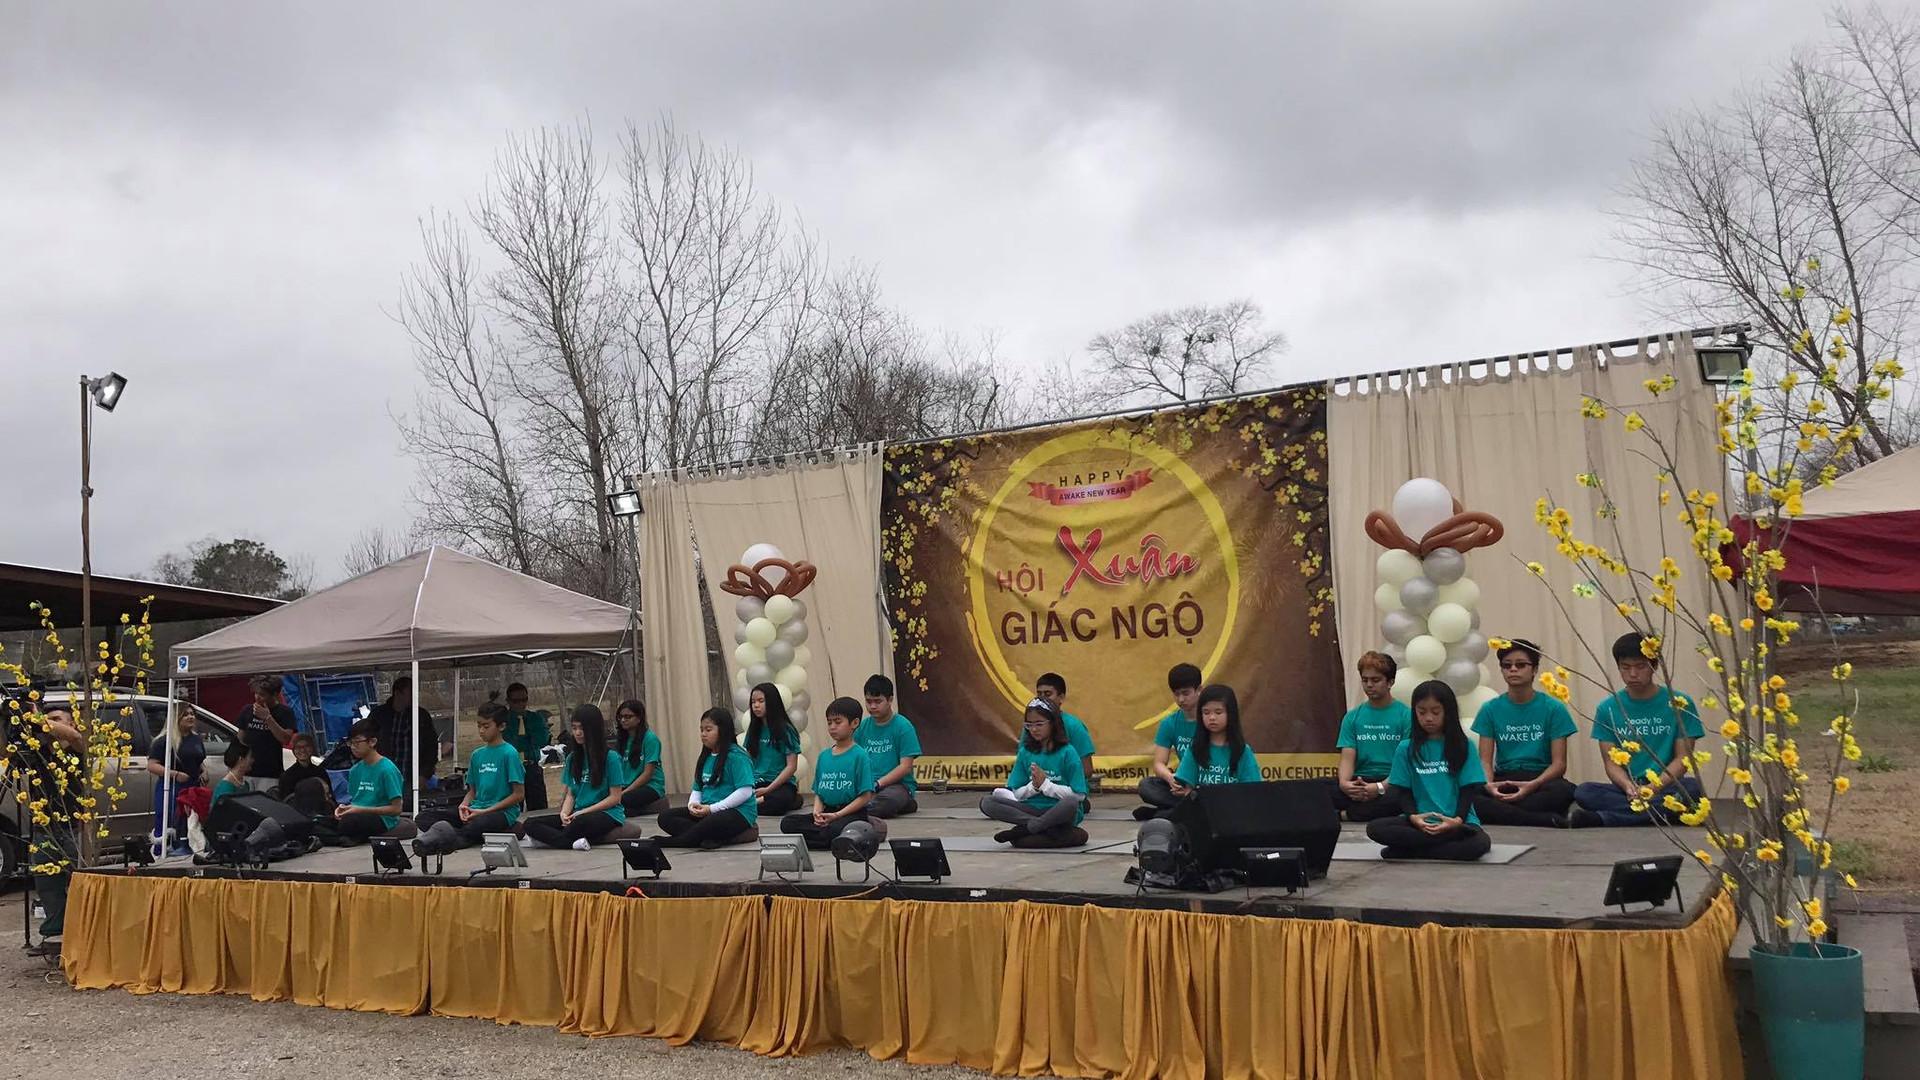 Hoi Xuan Giac Ngo 2018 4.jpg